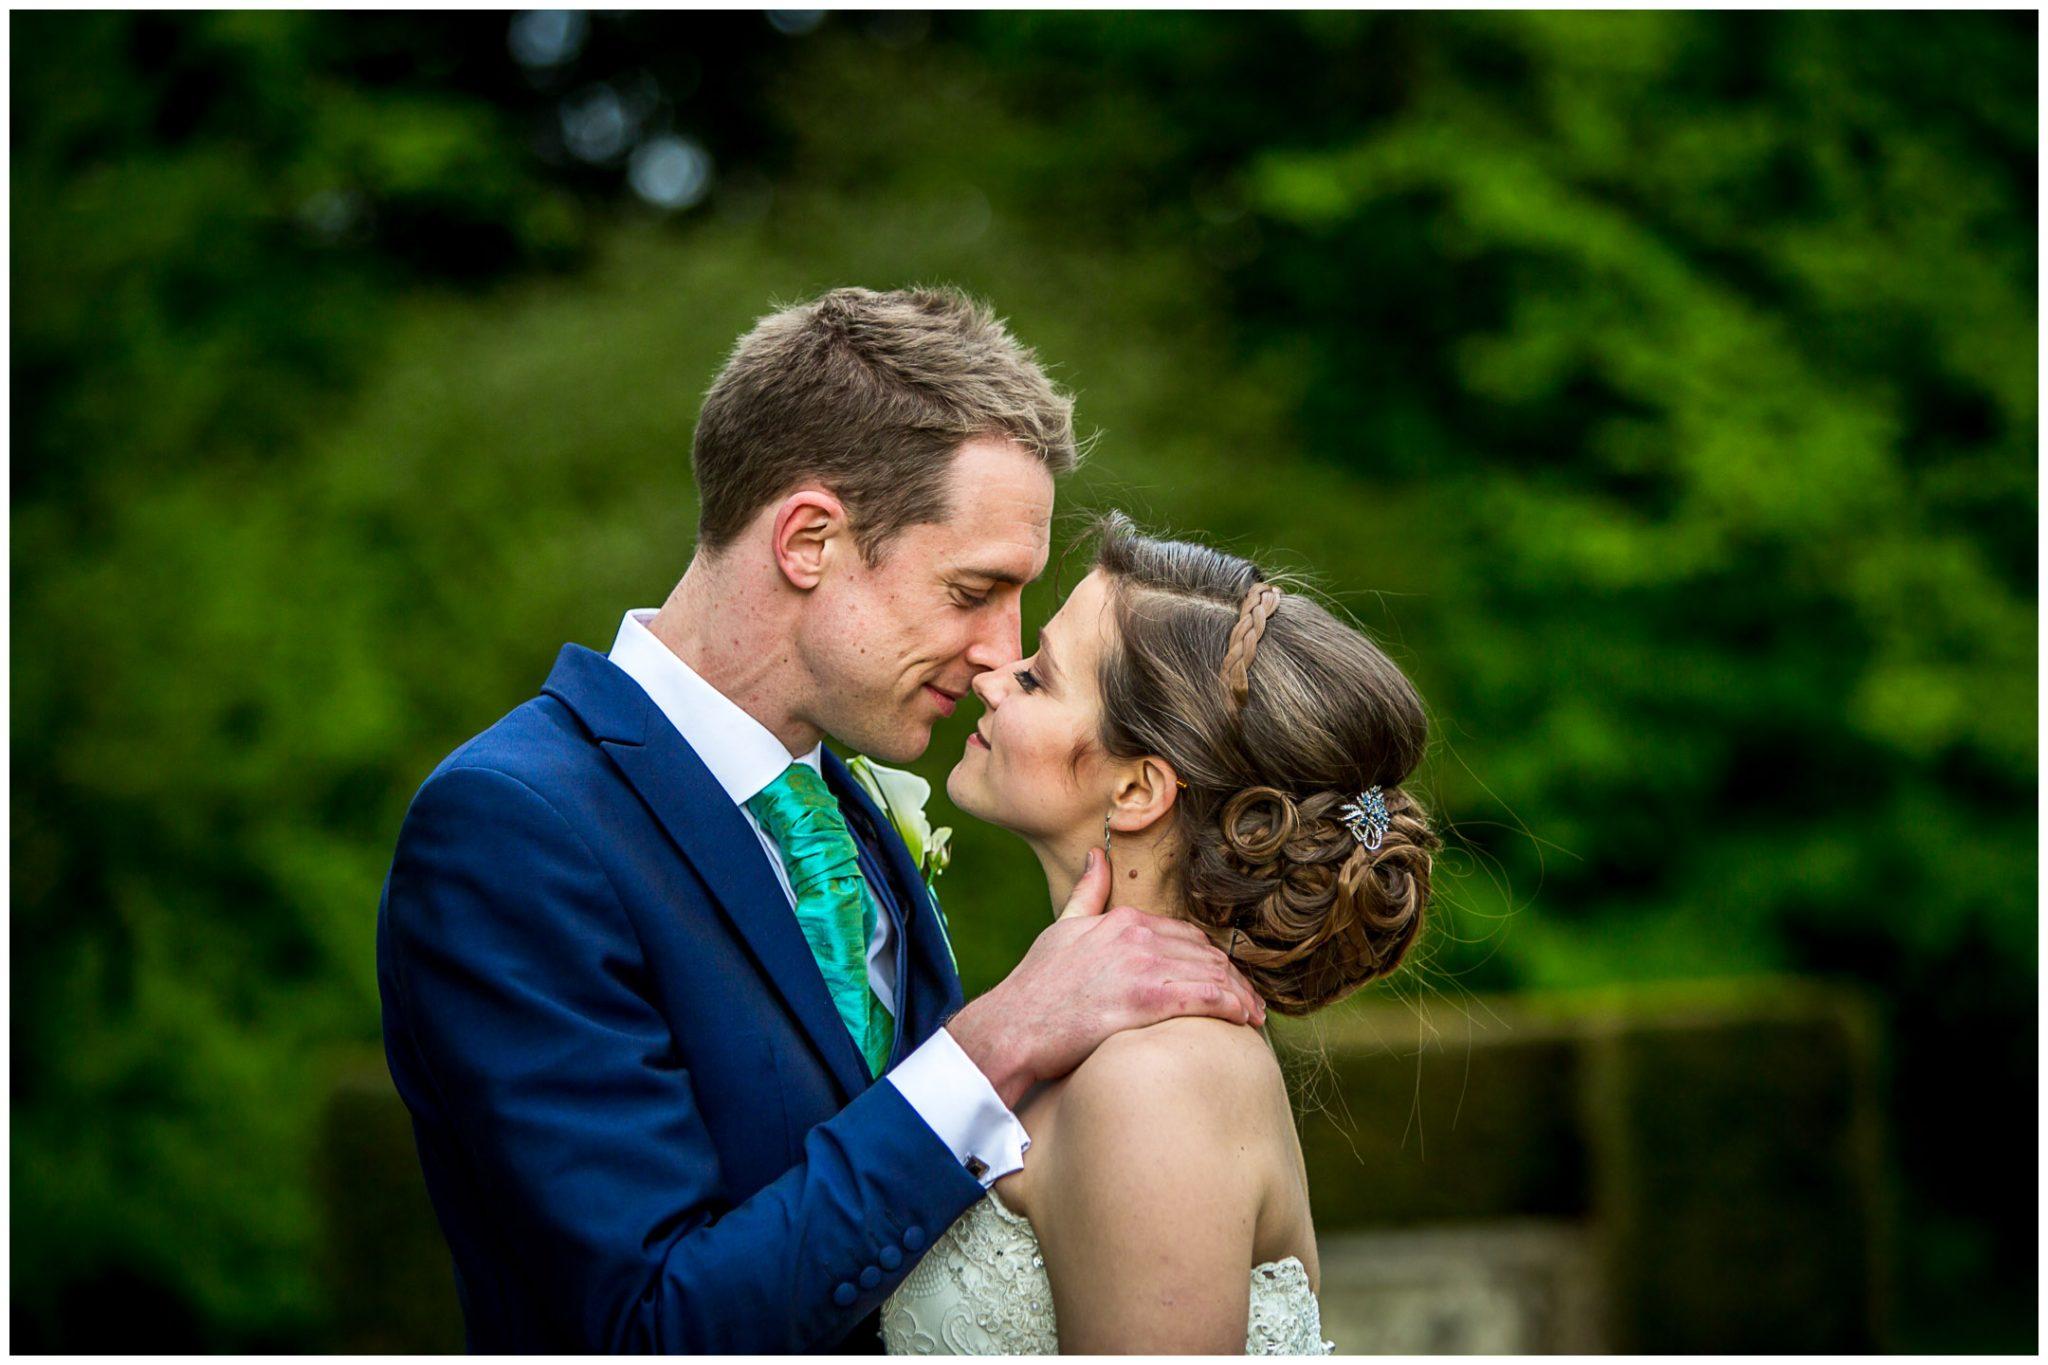 Avington Park wedding photography couple kiss